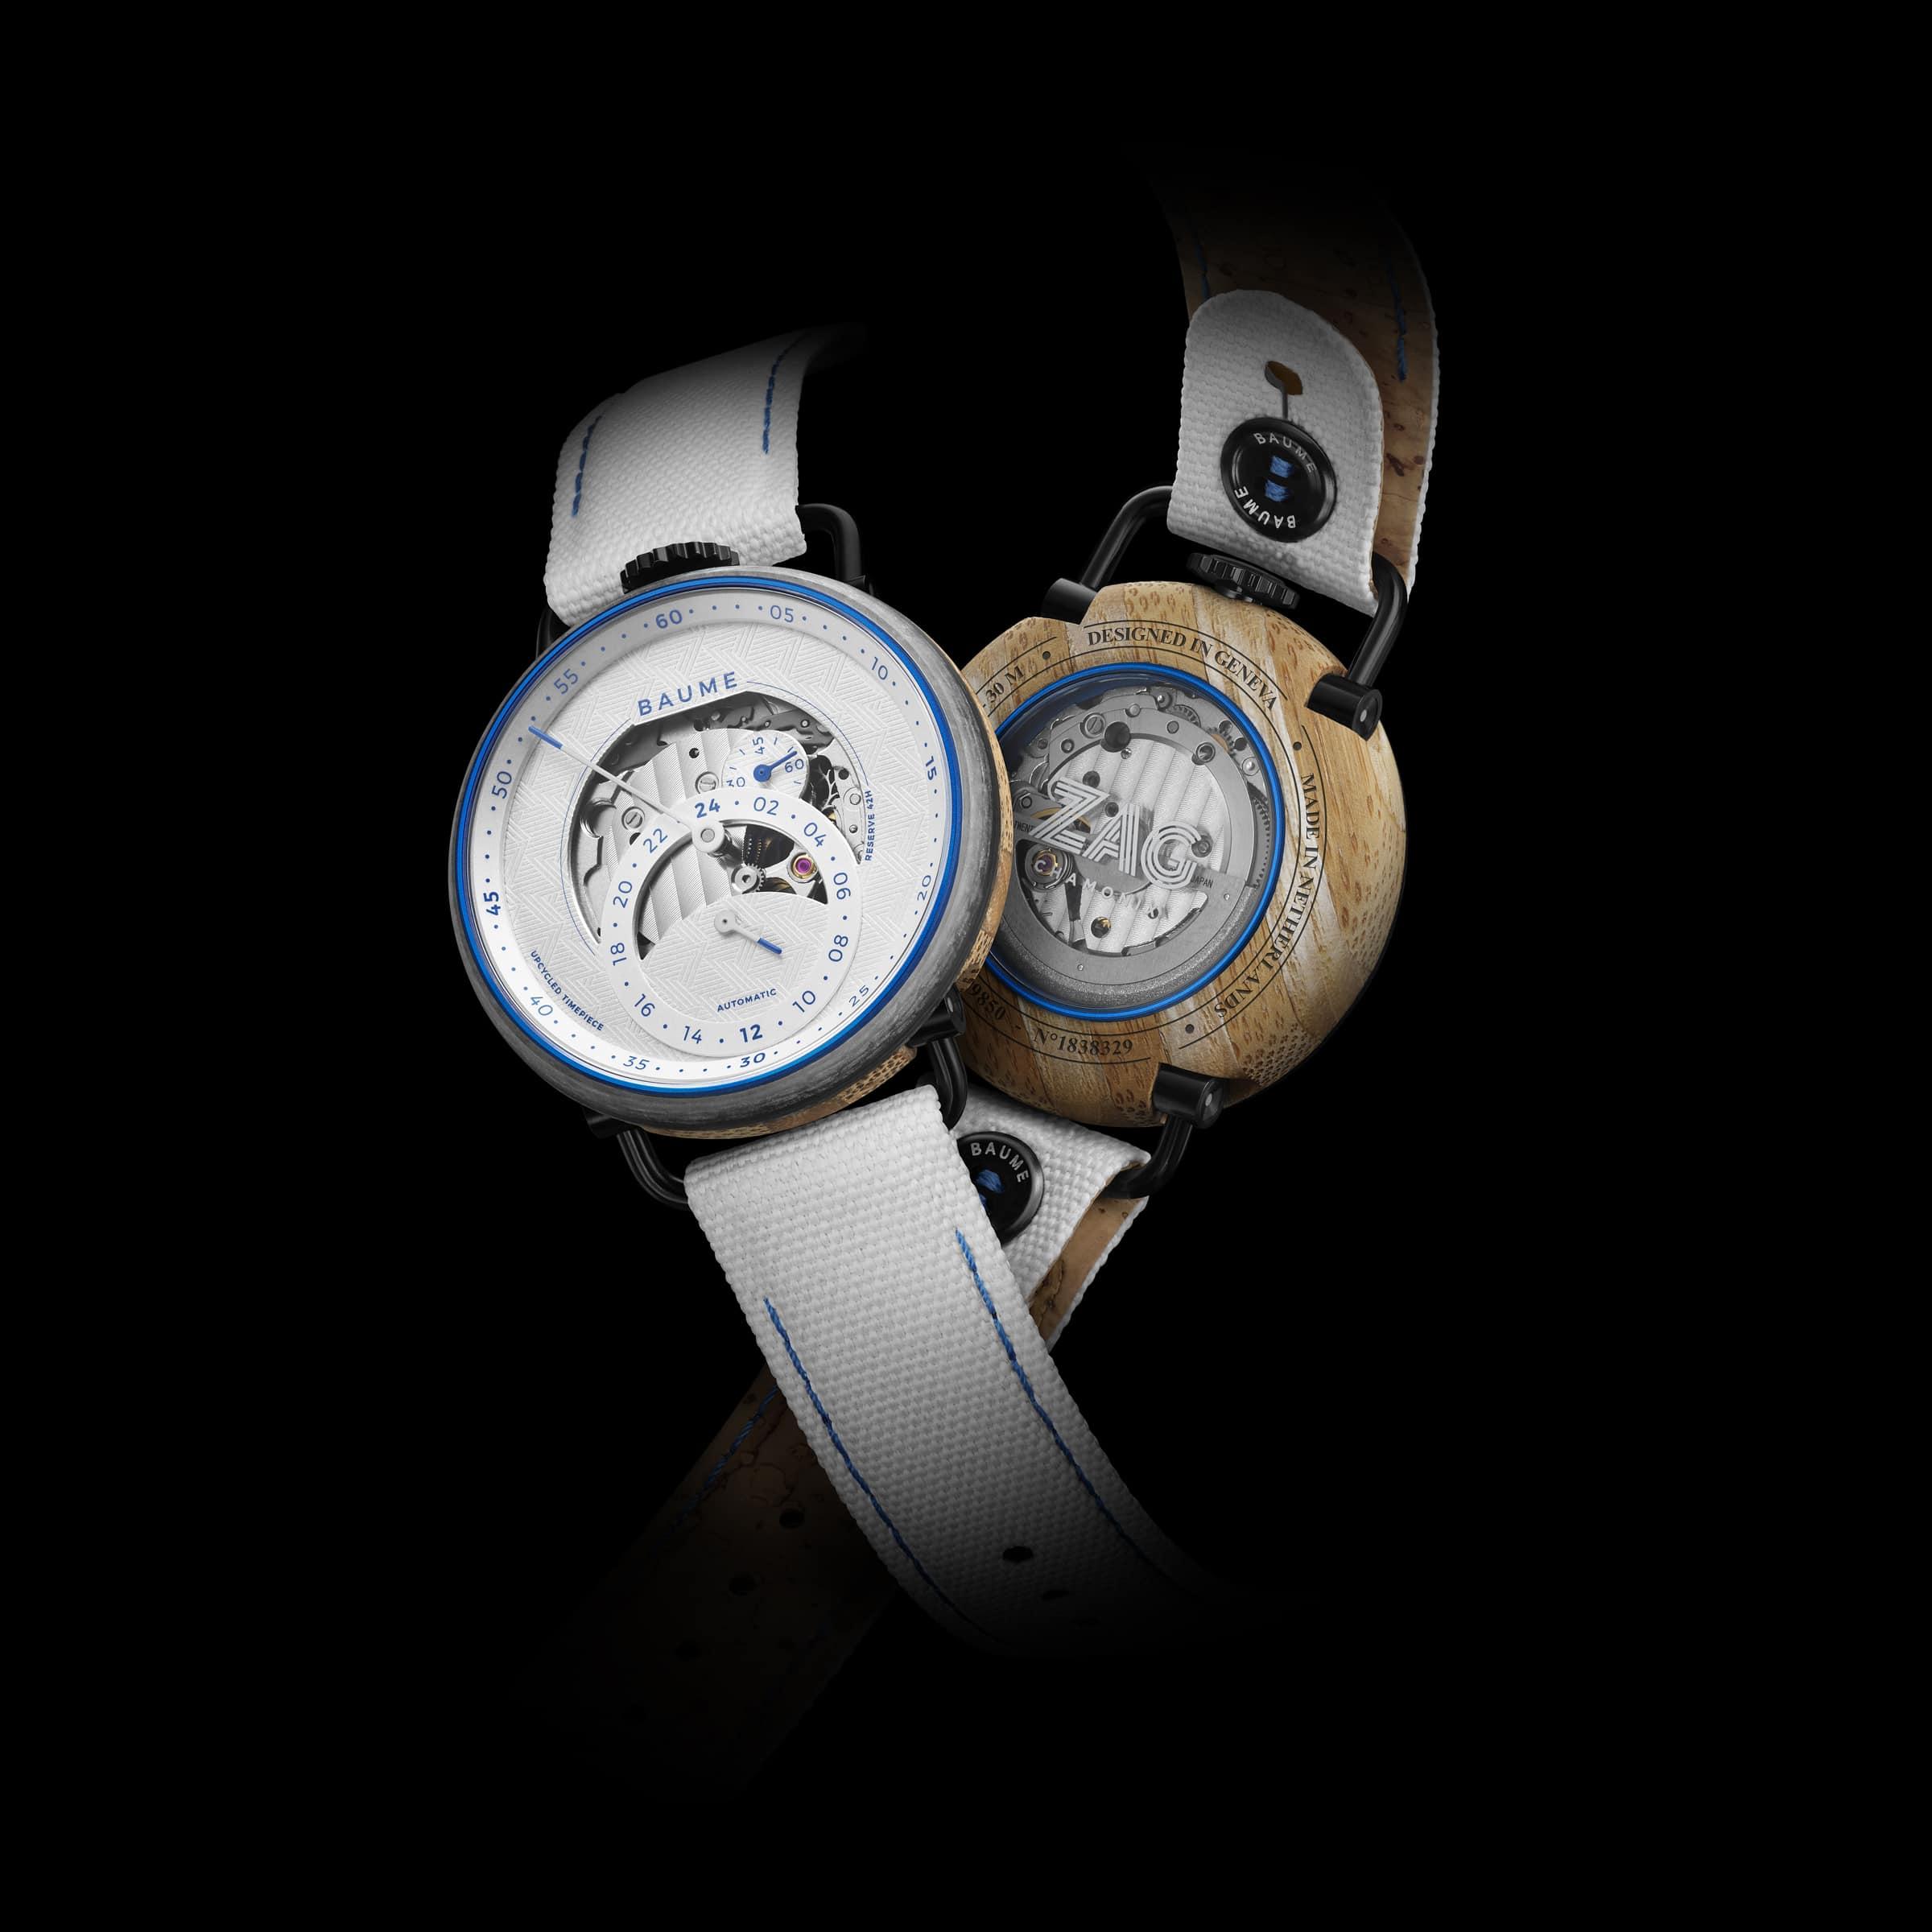 La montre Baume x Zag limited edition.